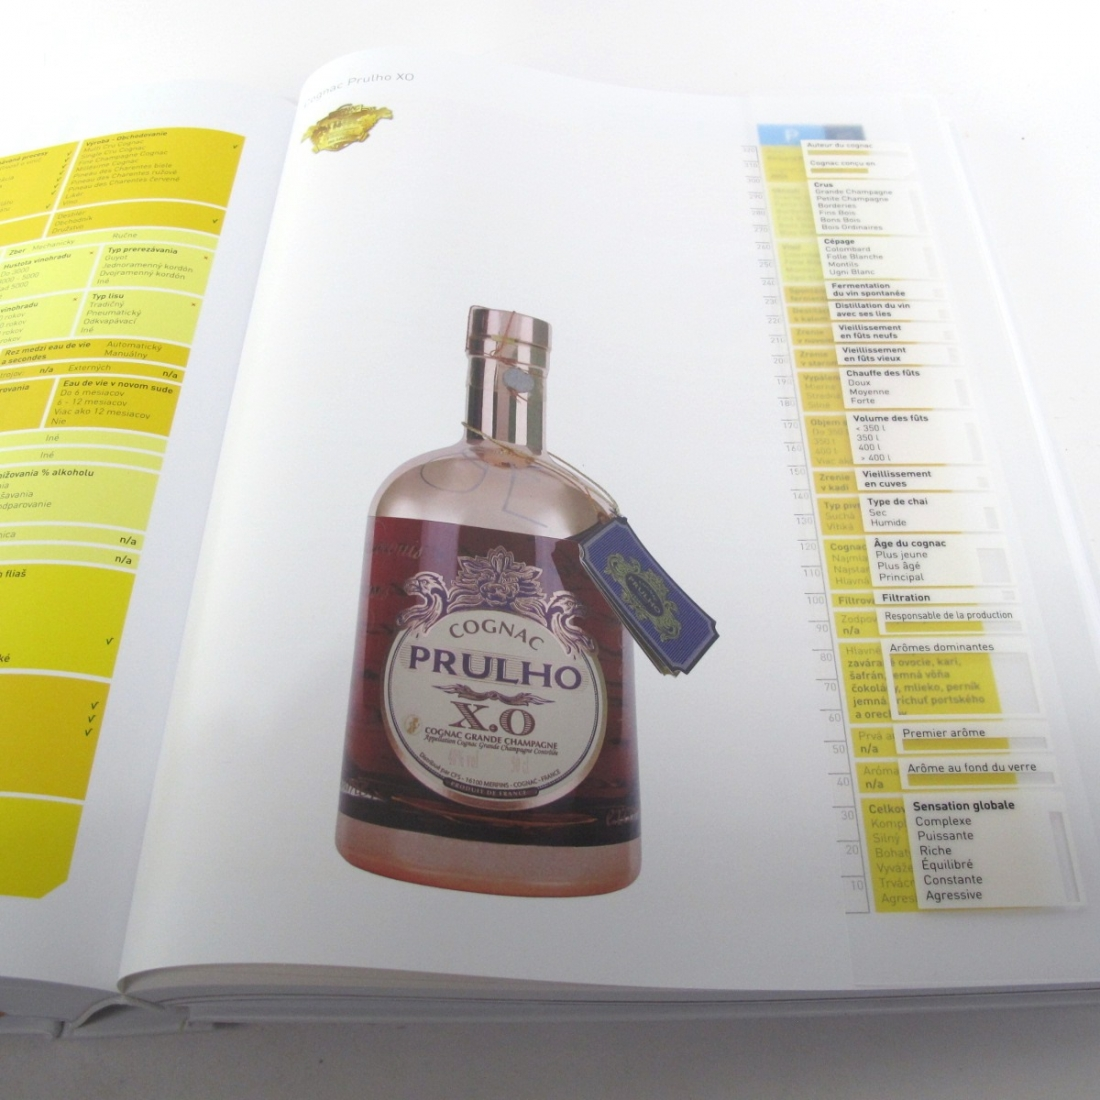 Alphabetical Encyclopedia of Cognac Houses & Brands